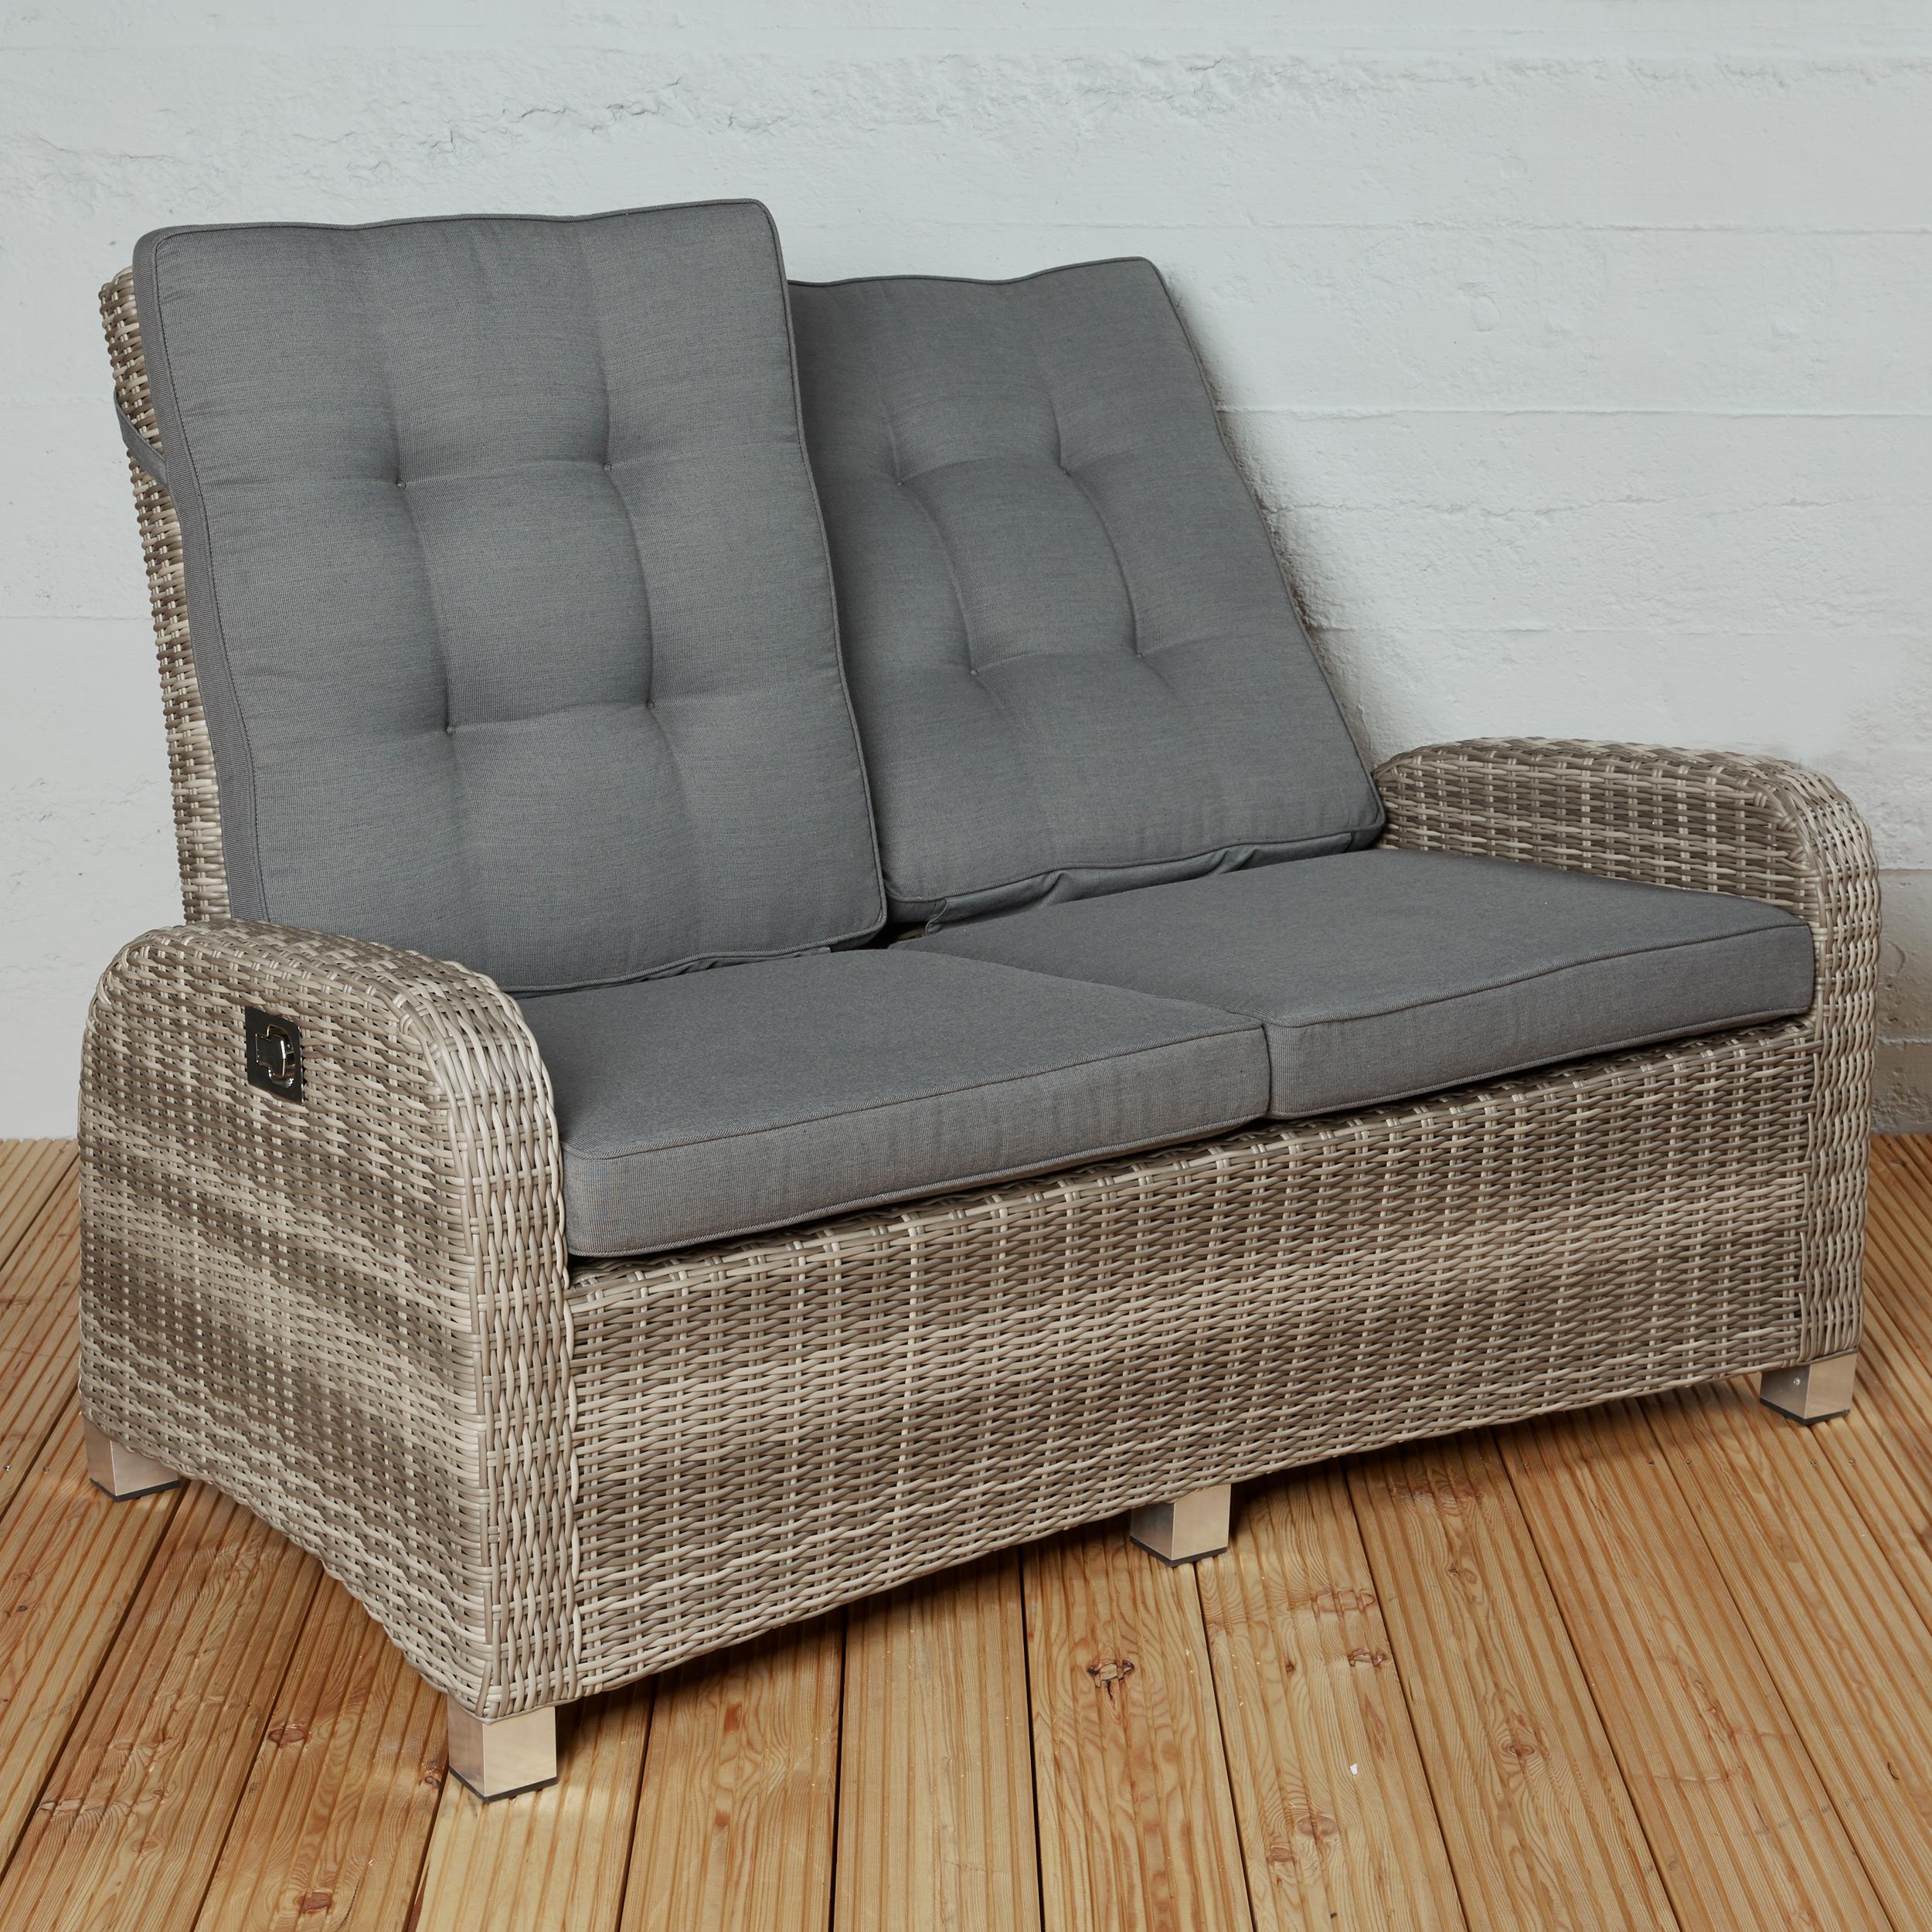 polyrattan 2 sitzer sofa braun couch ibiza lounge gartenm bel set gartensofa ebay. Black Bedroom Furniture Sets. Home Design Ideas